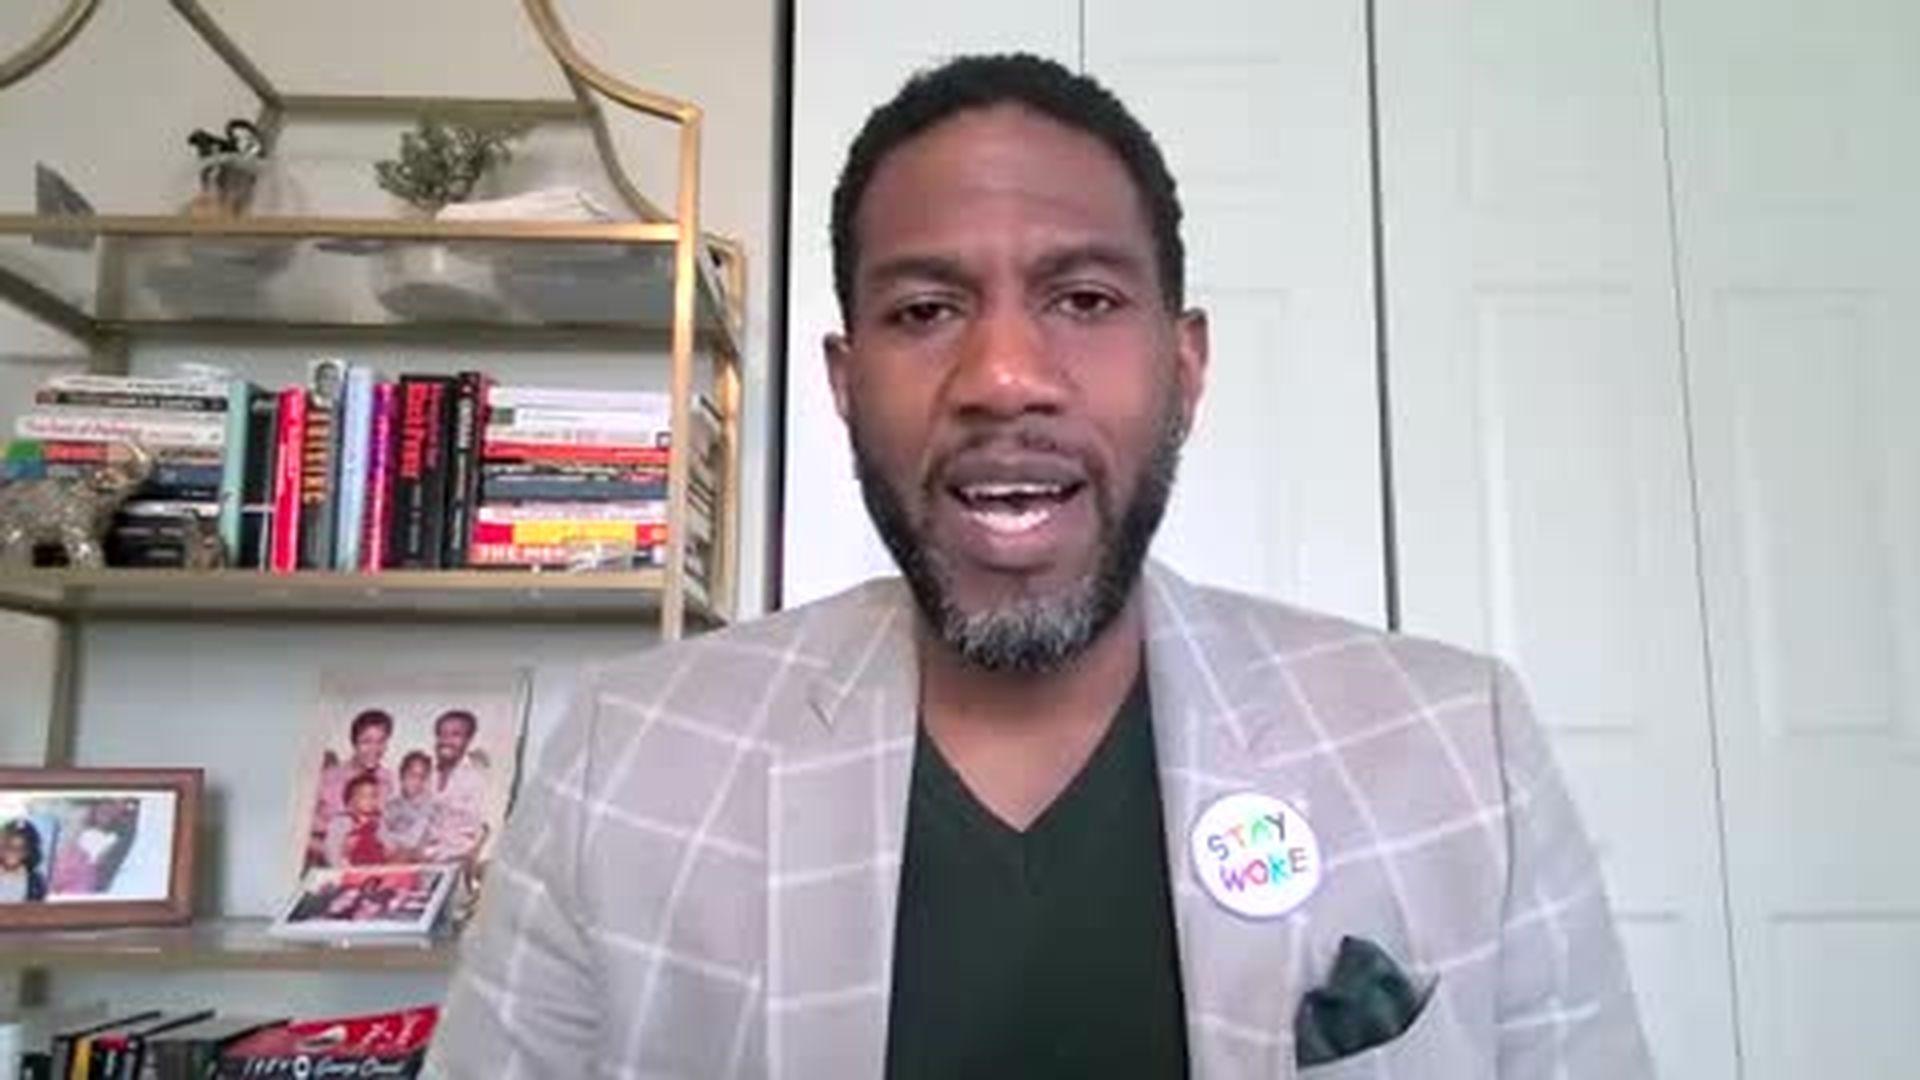 Jumaane Williams | Democratic Candidate for New York Public Advocate